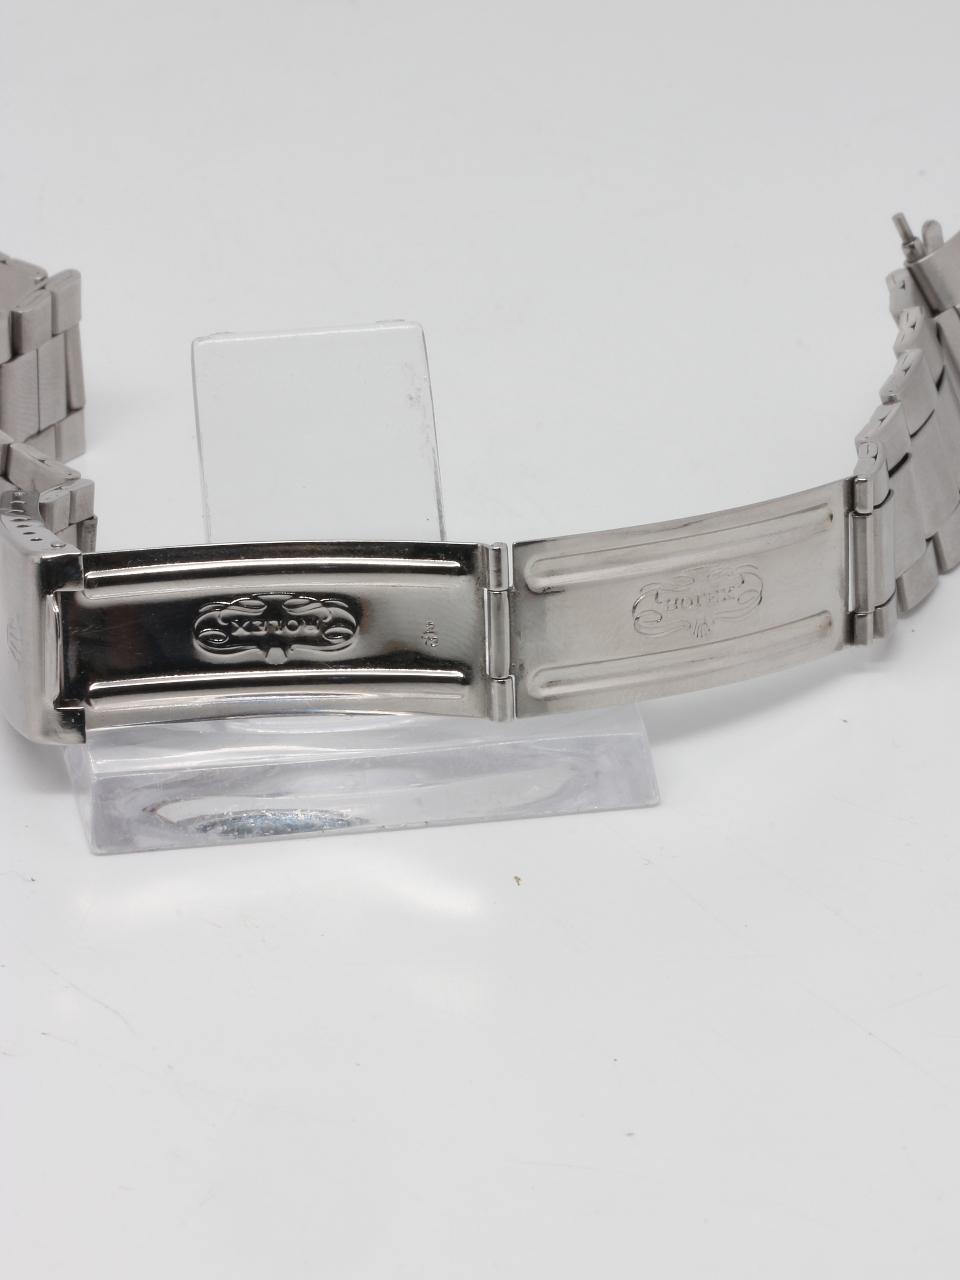 Rolex Milgauss ref 1019 Rare Cern Model circa 1970